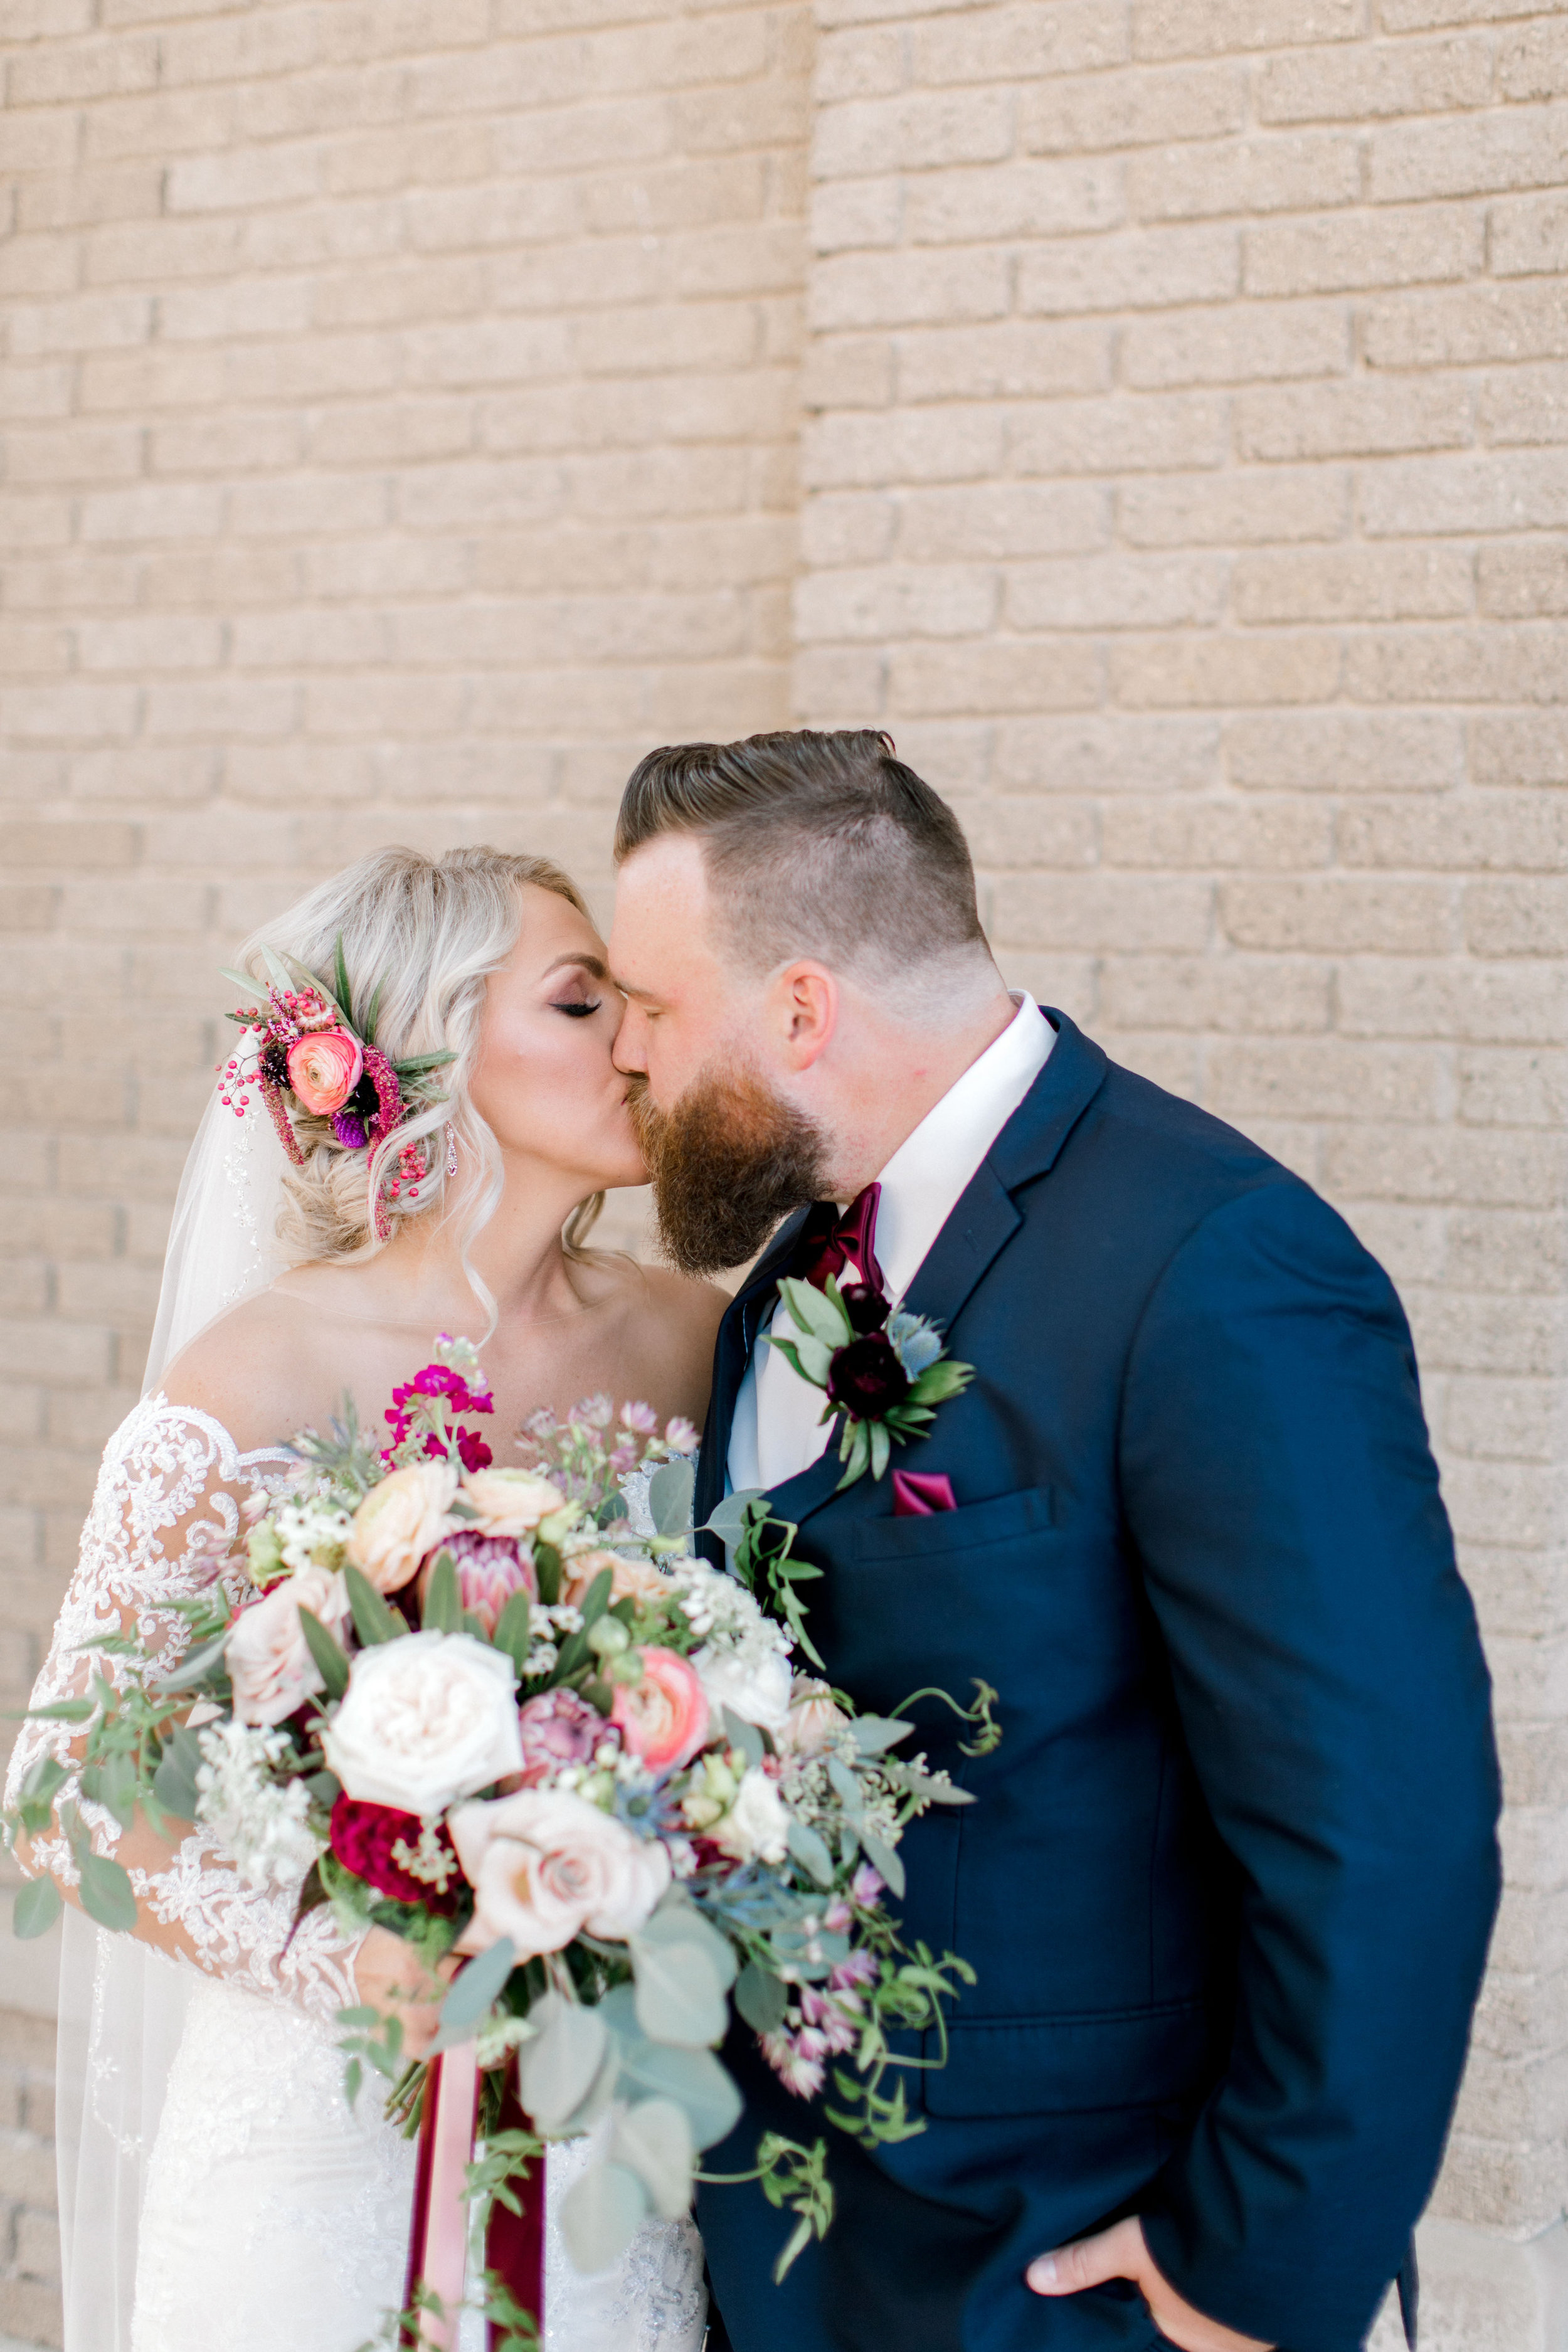 Ryan Alexa Married-Portraits-0010.jpg